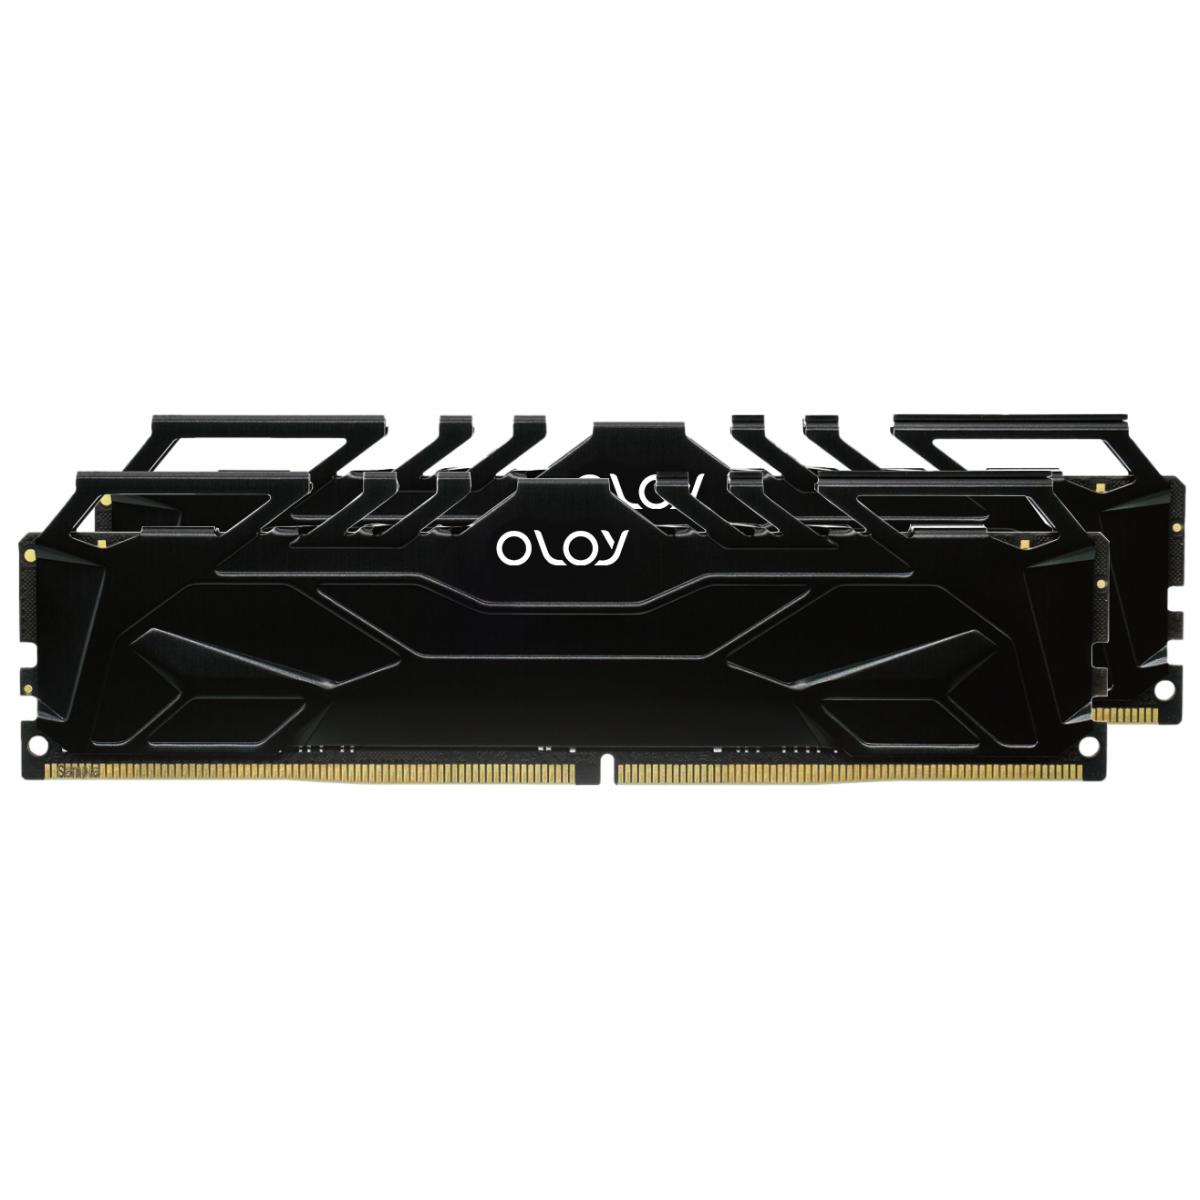 Memória DDR4 OLOy Owl Black, 16GB (2x8GB), 3000MHz, Black, MD4U083016BJSA